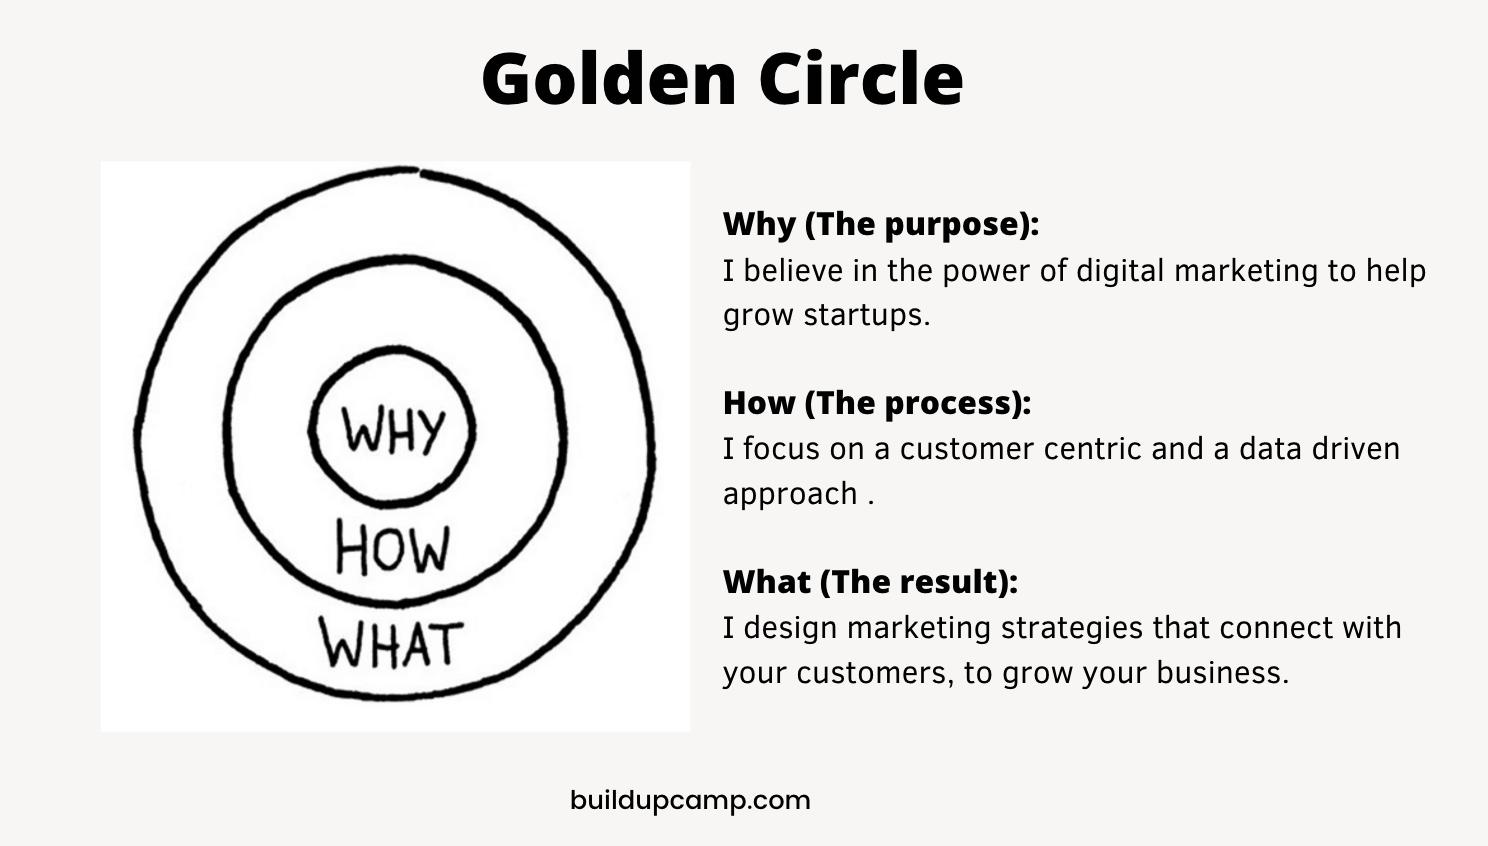 Golden circle for startups